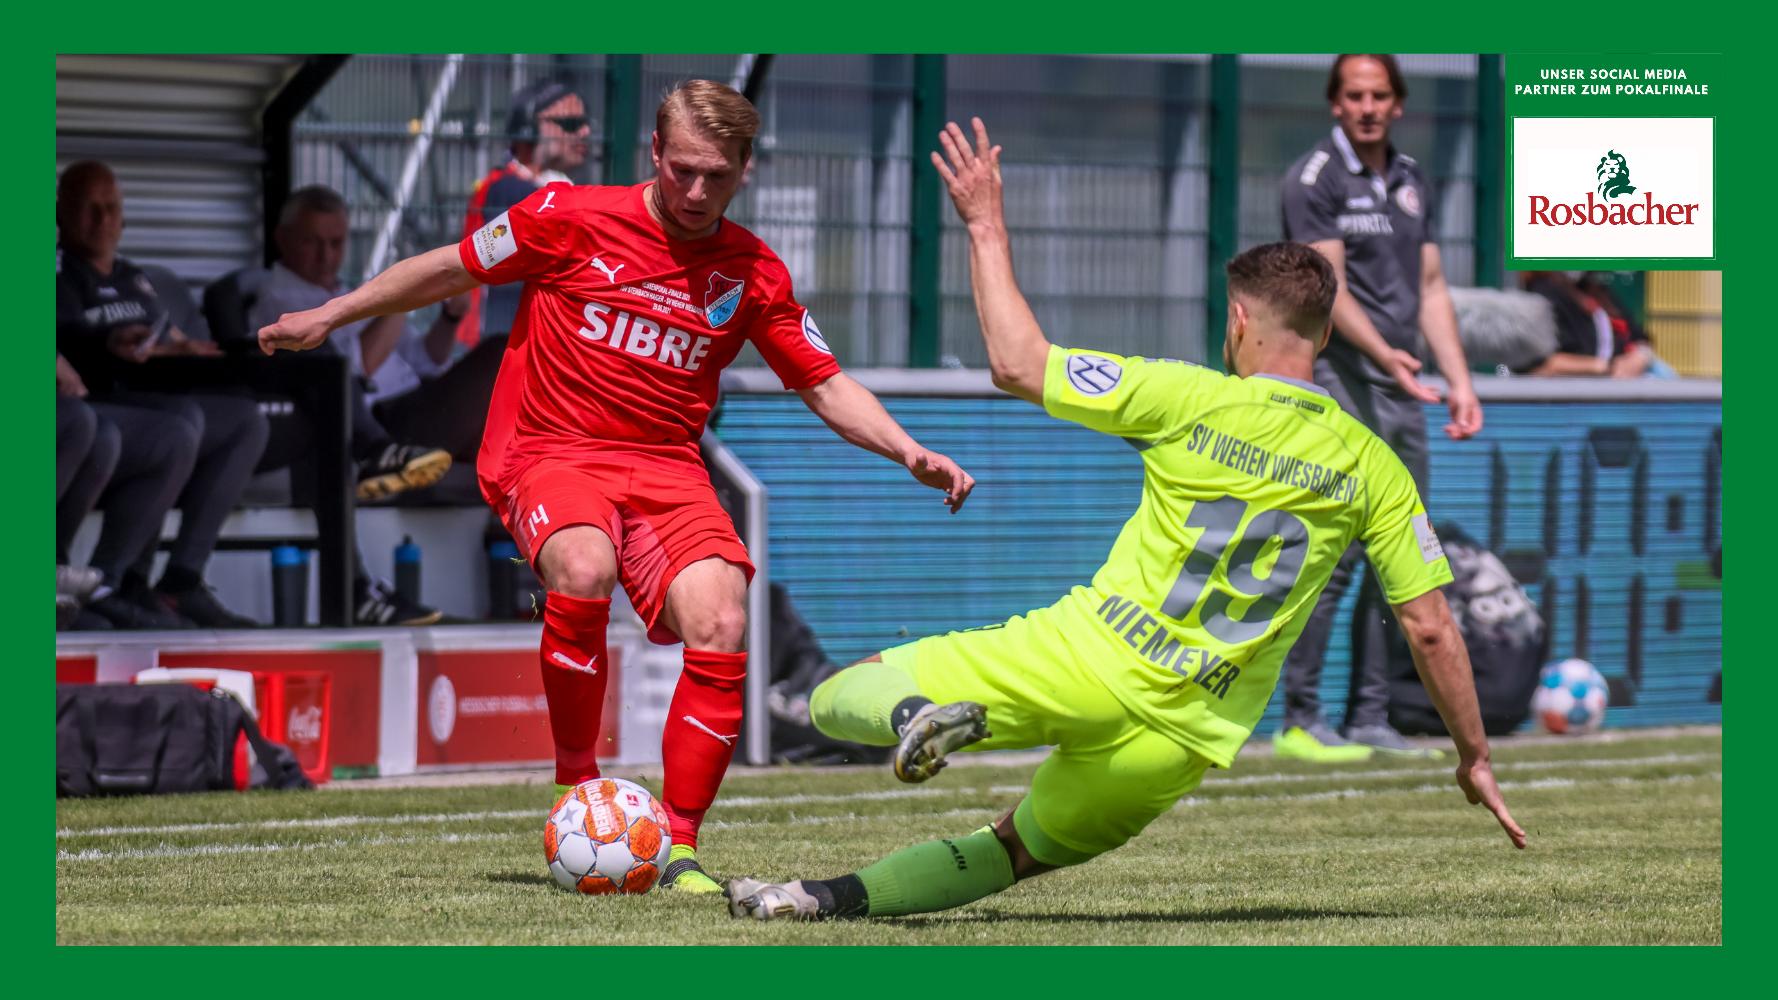 Philipp Hanke TSV Steinbach Haiger Hessenpokal SV Wehen Wiesbaden Nick Fingerhut